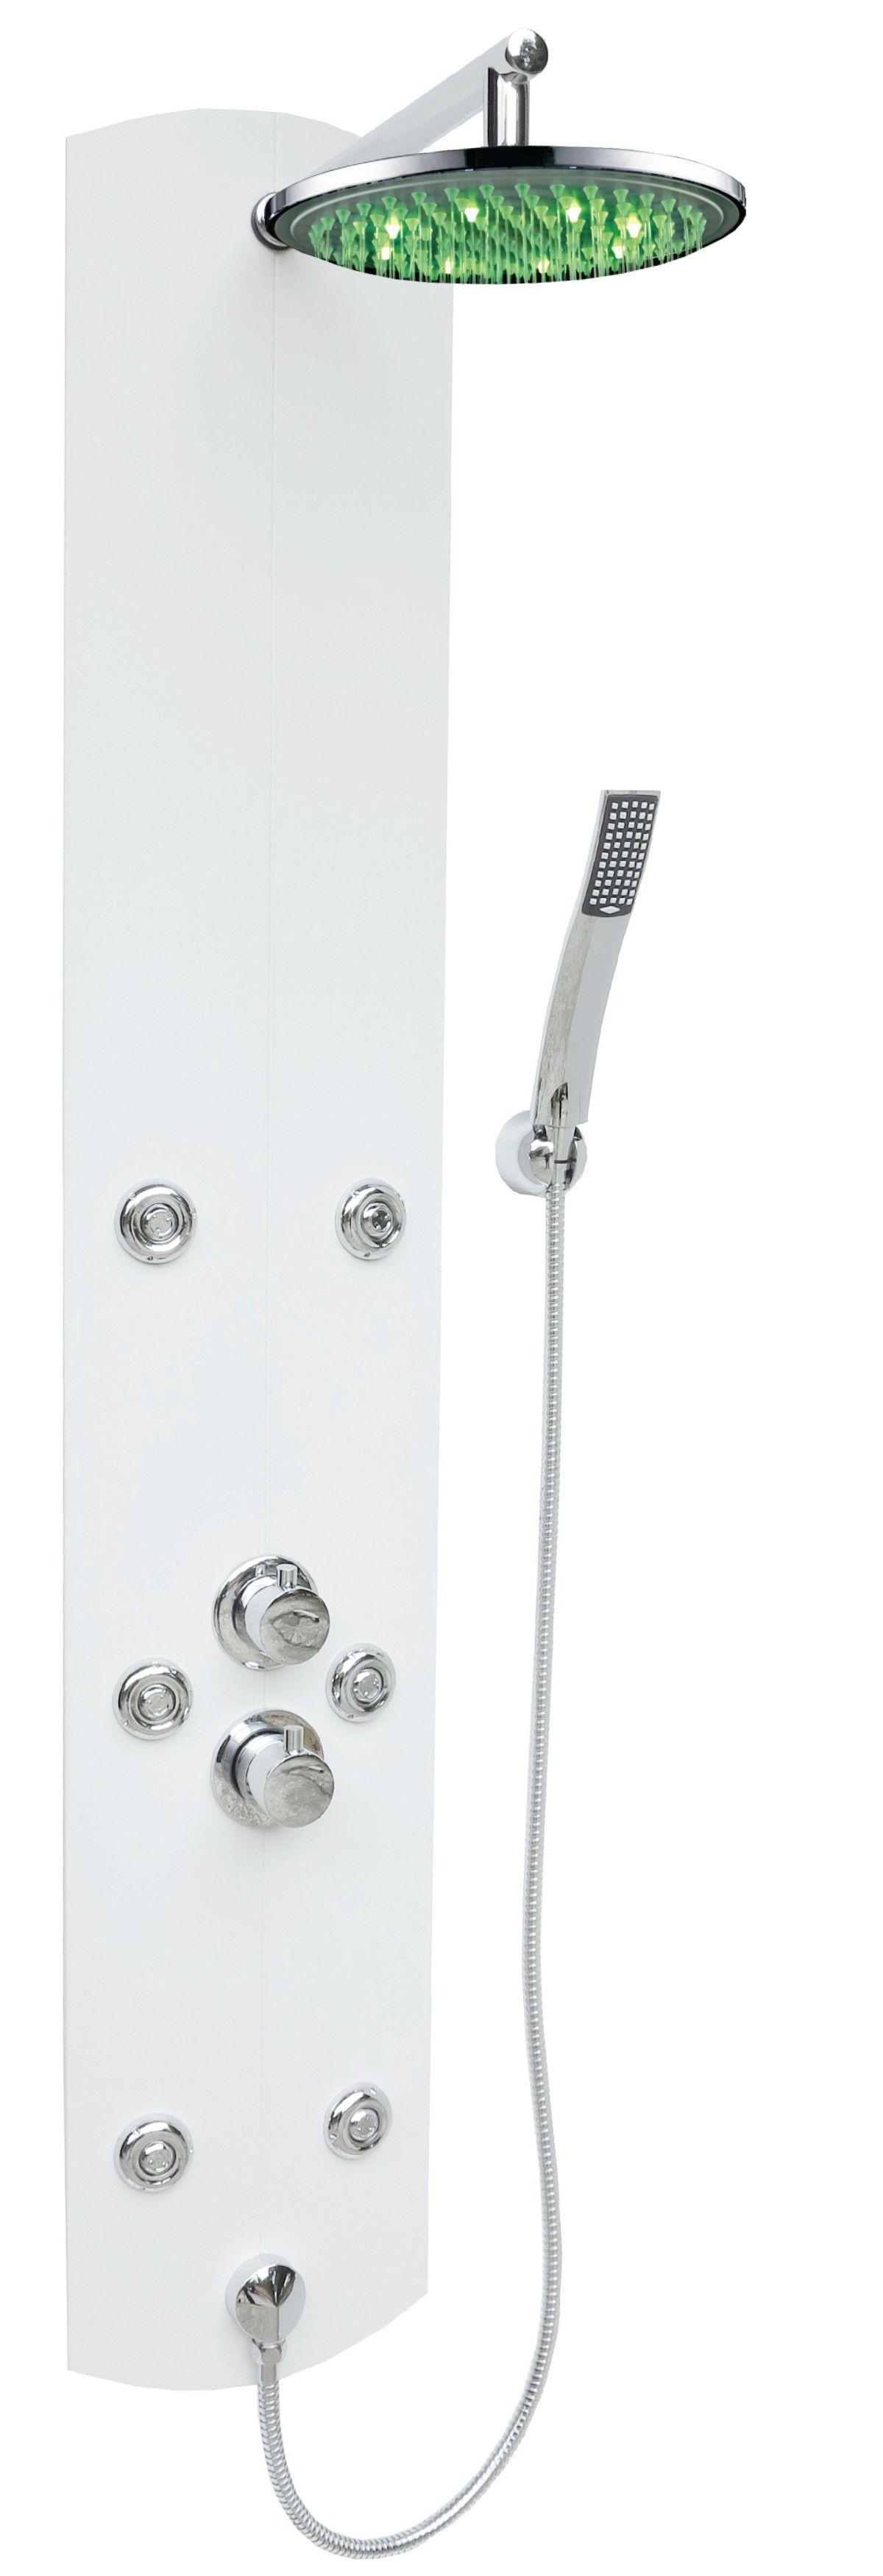 duschpaneel led regendusche duschs ule duscharmatur thermostat dusche duschset ebay. Black Bedroom Furniture Sets. Home Design Ideas